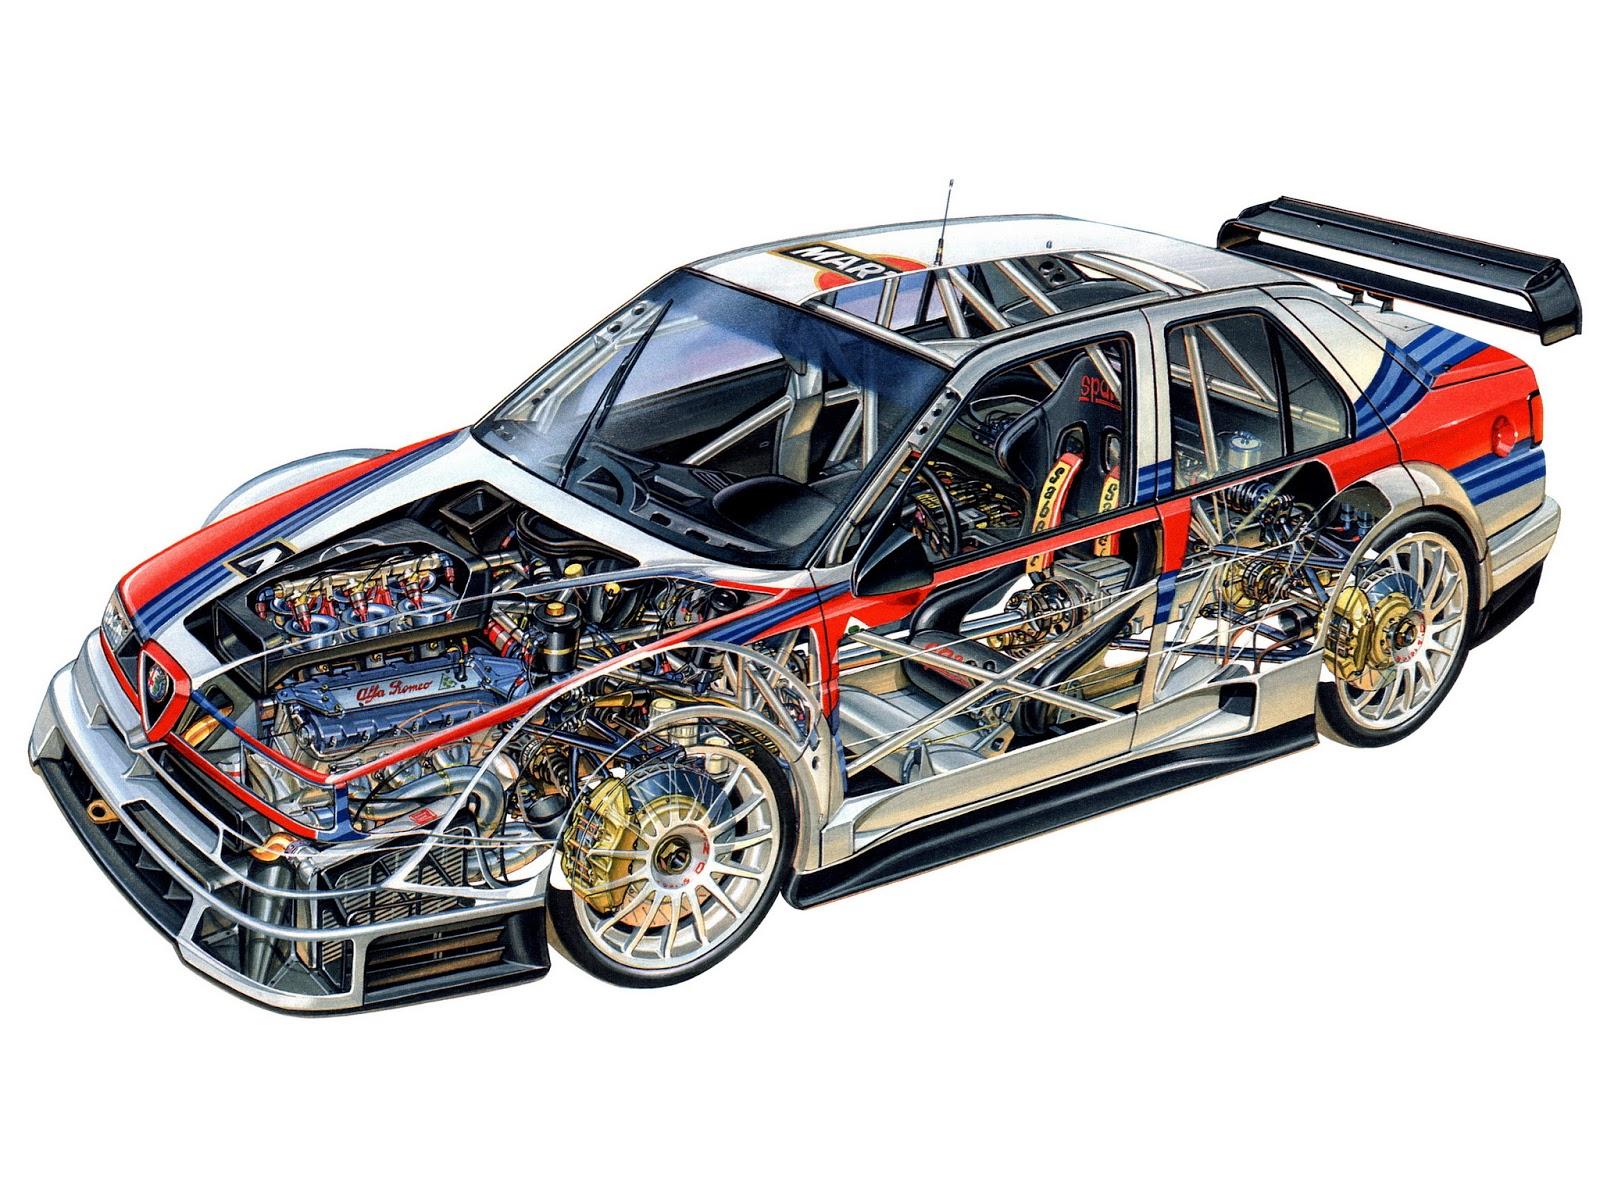 lfa2BRomeo2B1552BV62BTi Άκου τον ήχο του V6 της Alfa Romeo 155 Ti, να περνά ουρλιάζοντας στις 12,000 σ.α.λ, μέσα από τα ιταλικά βουνά. alfa romeo, Alfa Romeo 155, Alfa Romeo 155 V6 Ti